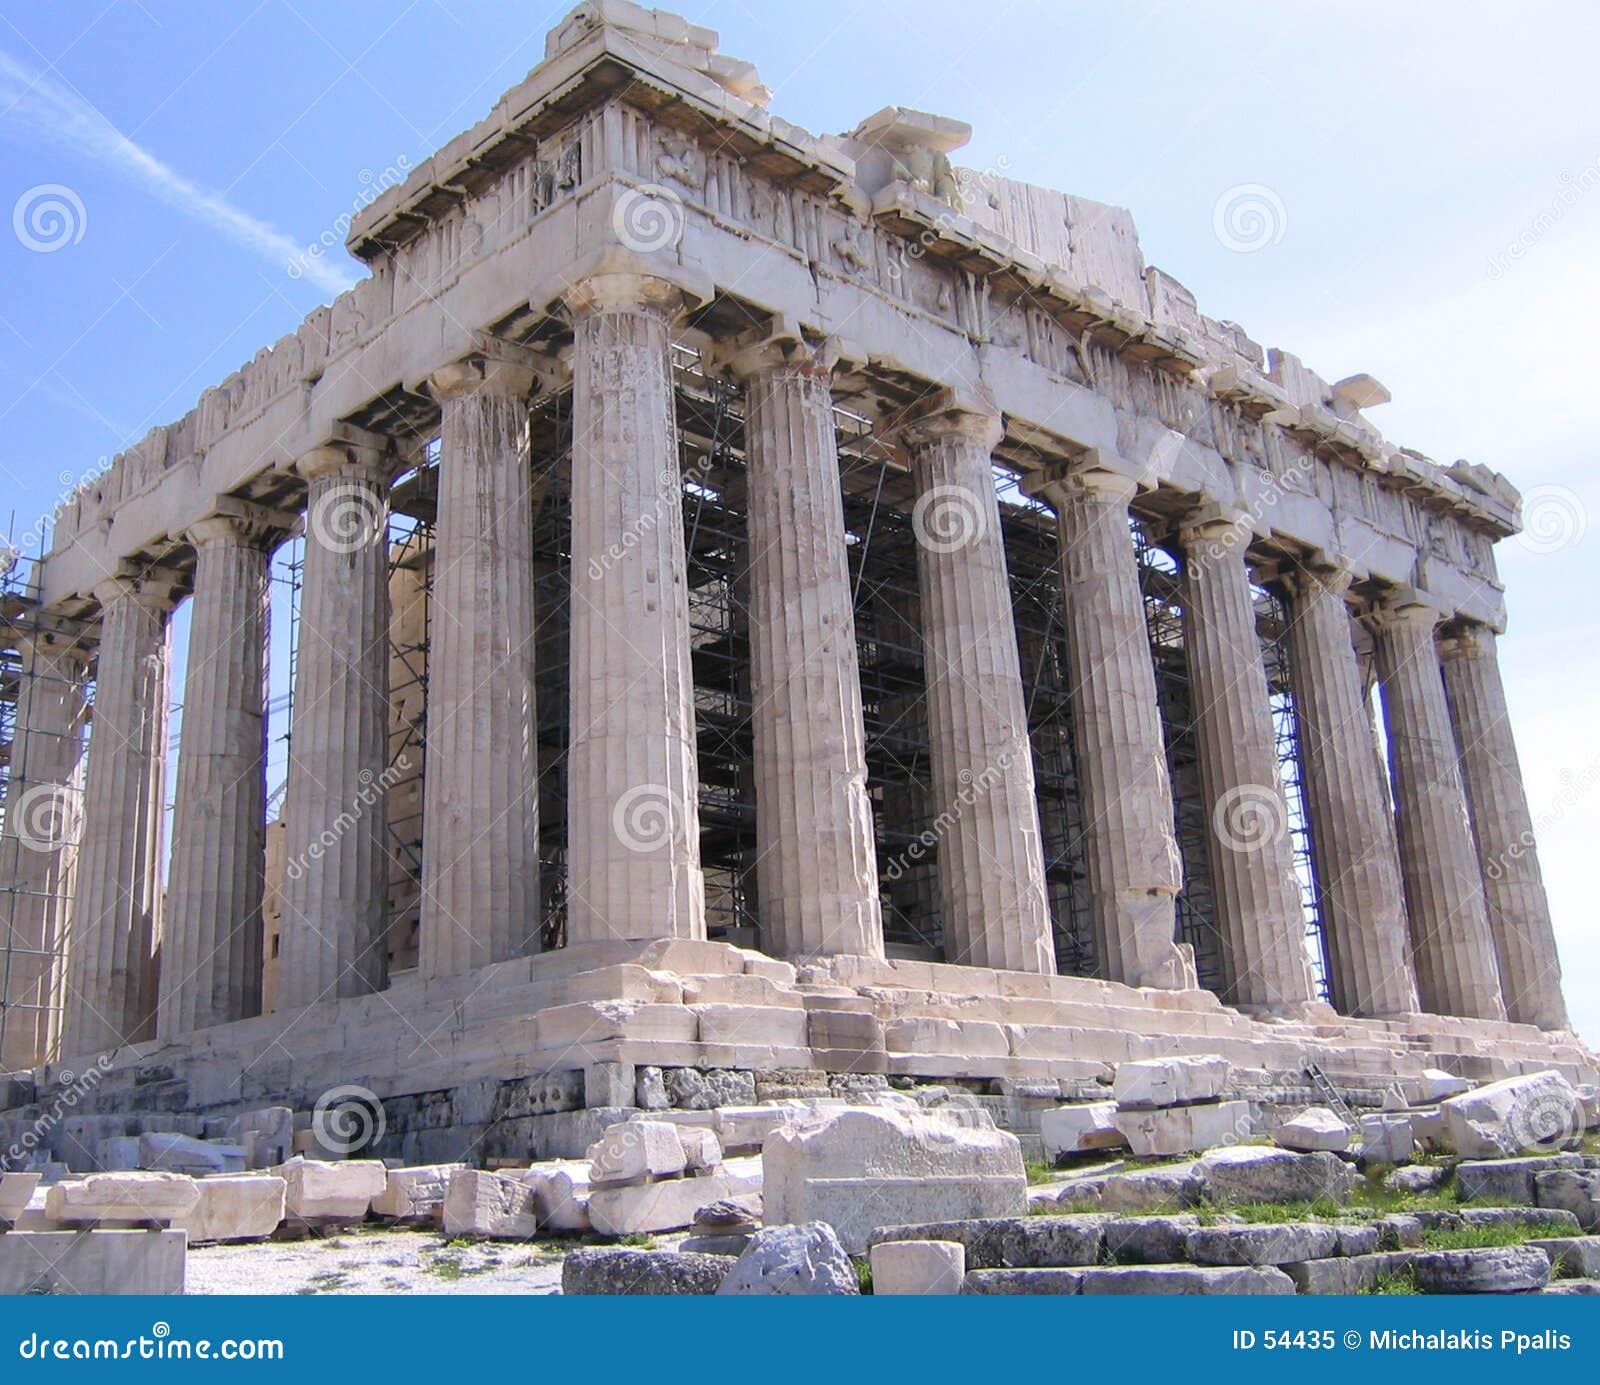 Parthenon en la acrópolis